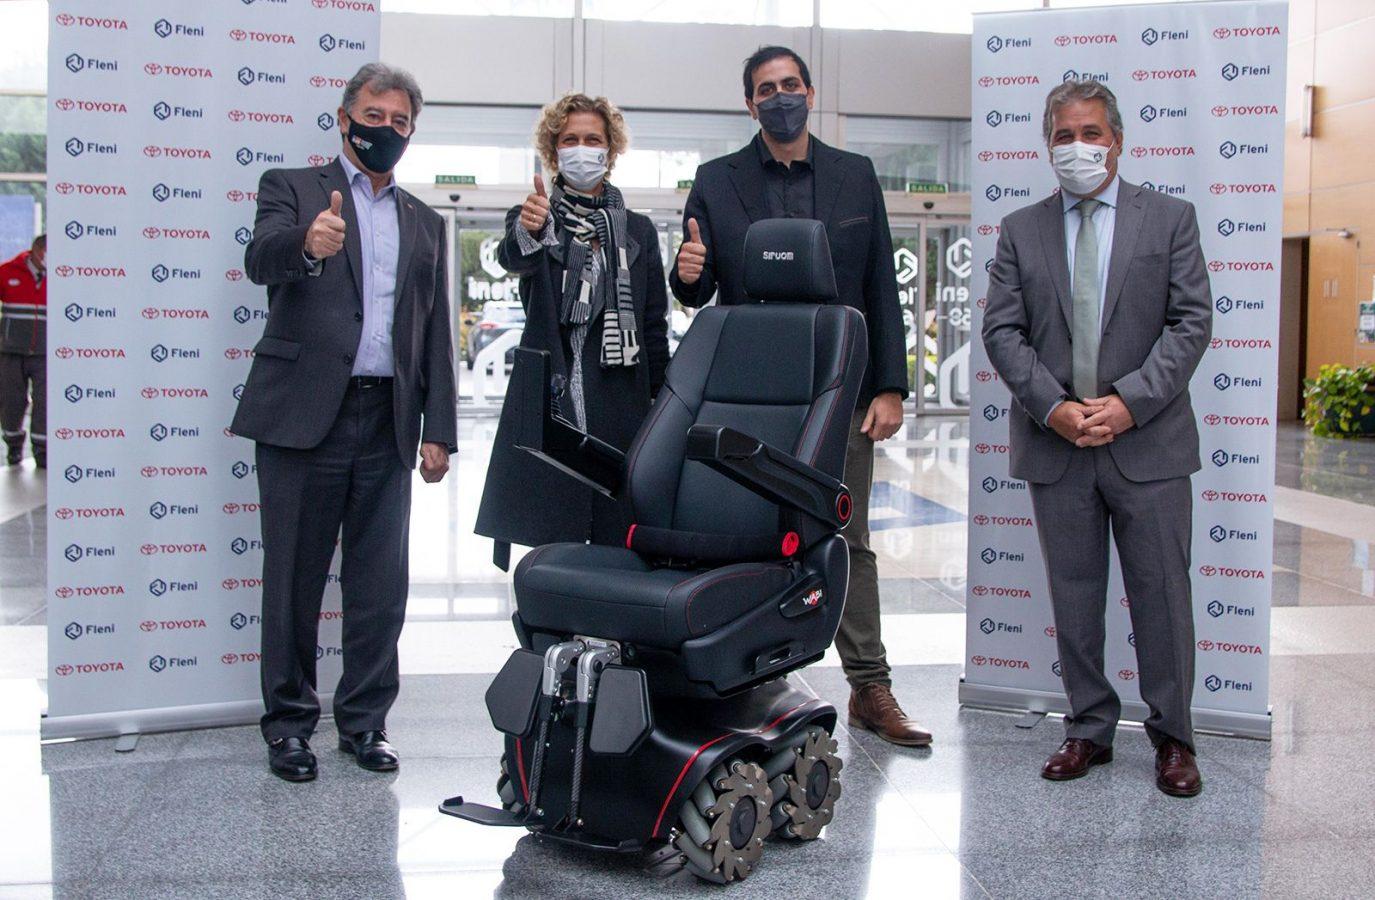 Toyota hizo entrega de una silla de ruedas SIRUOM a Fleni